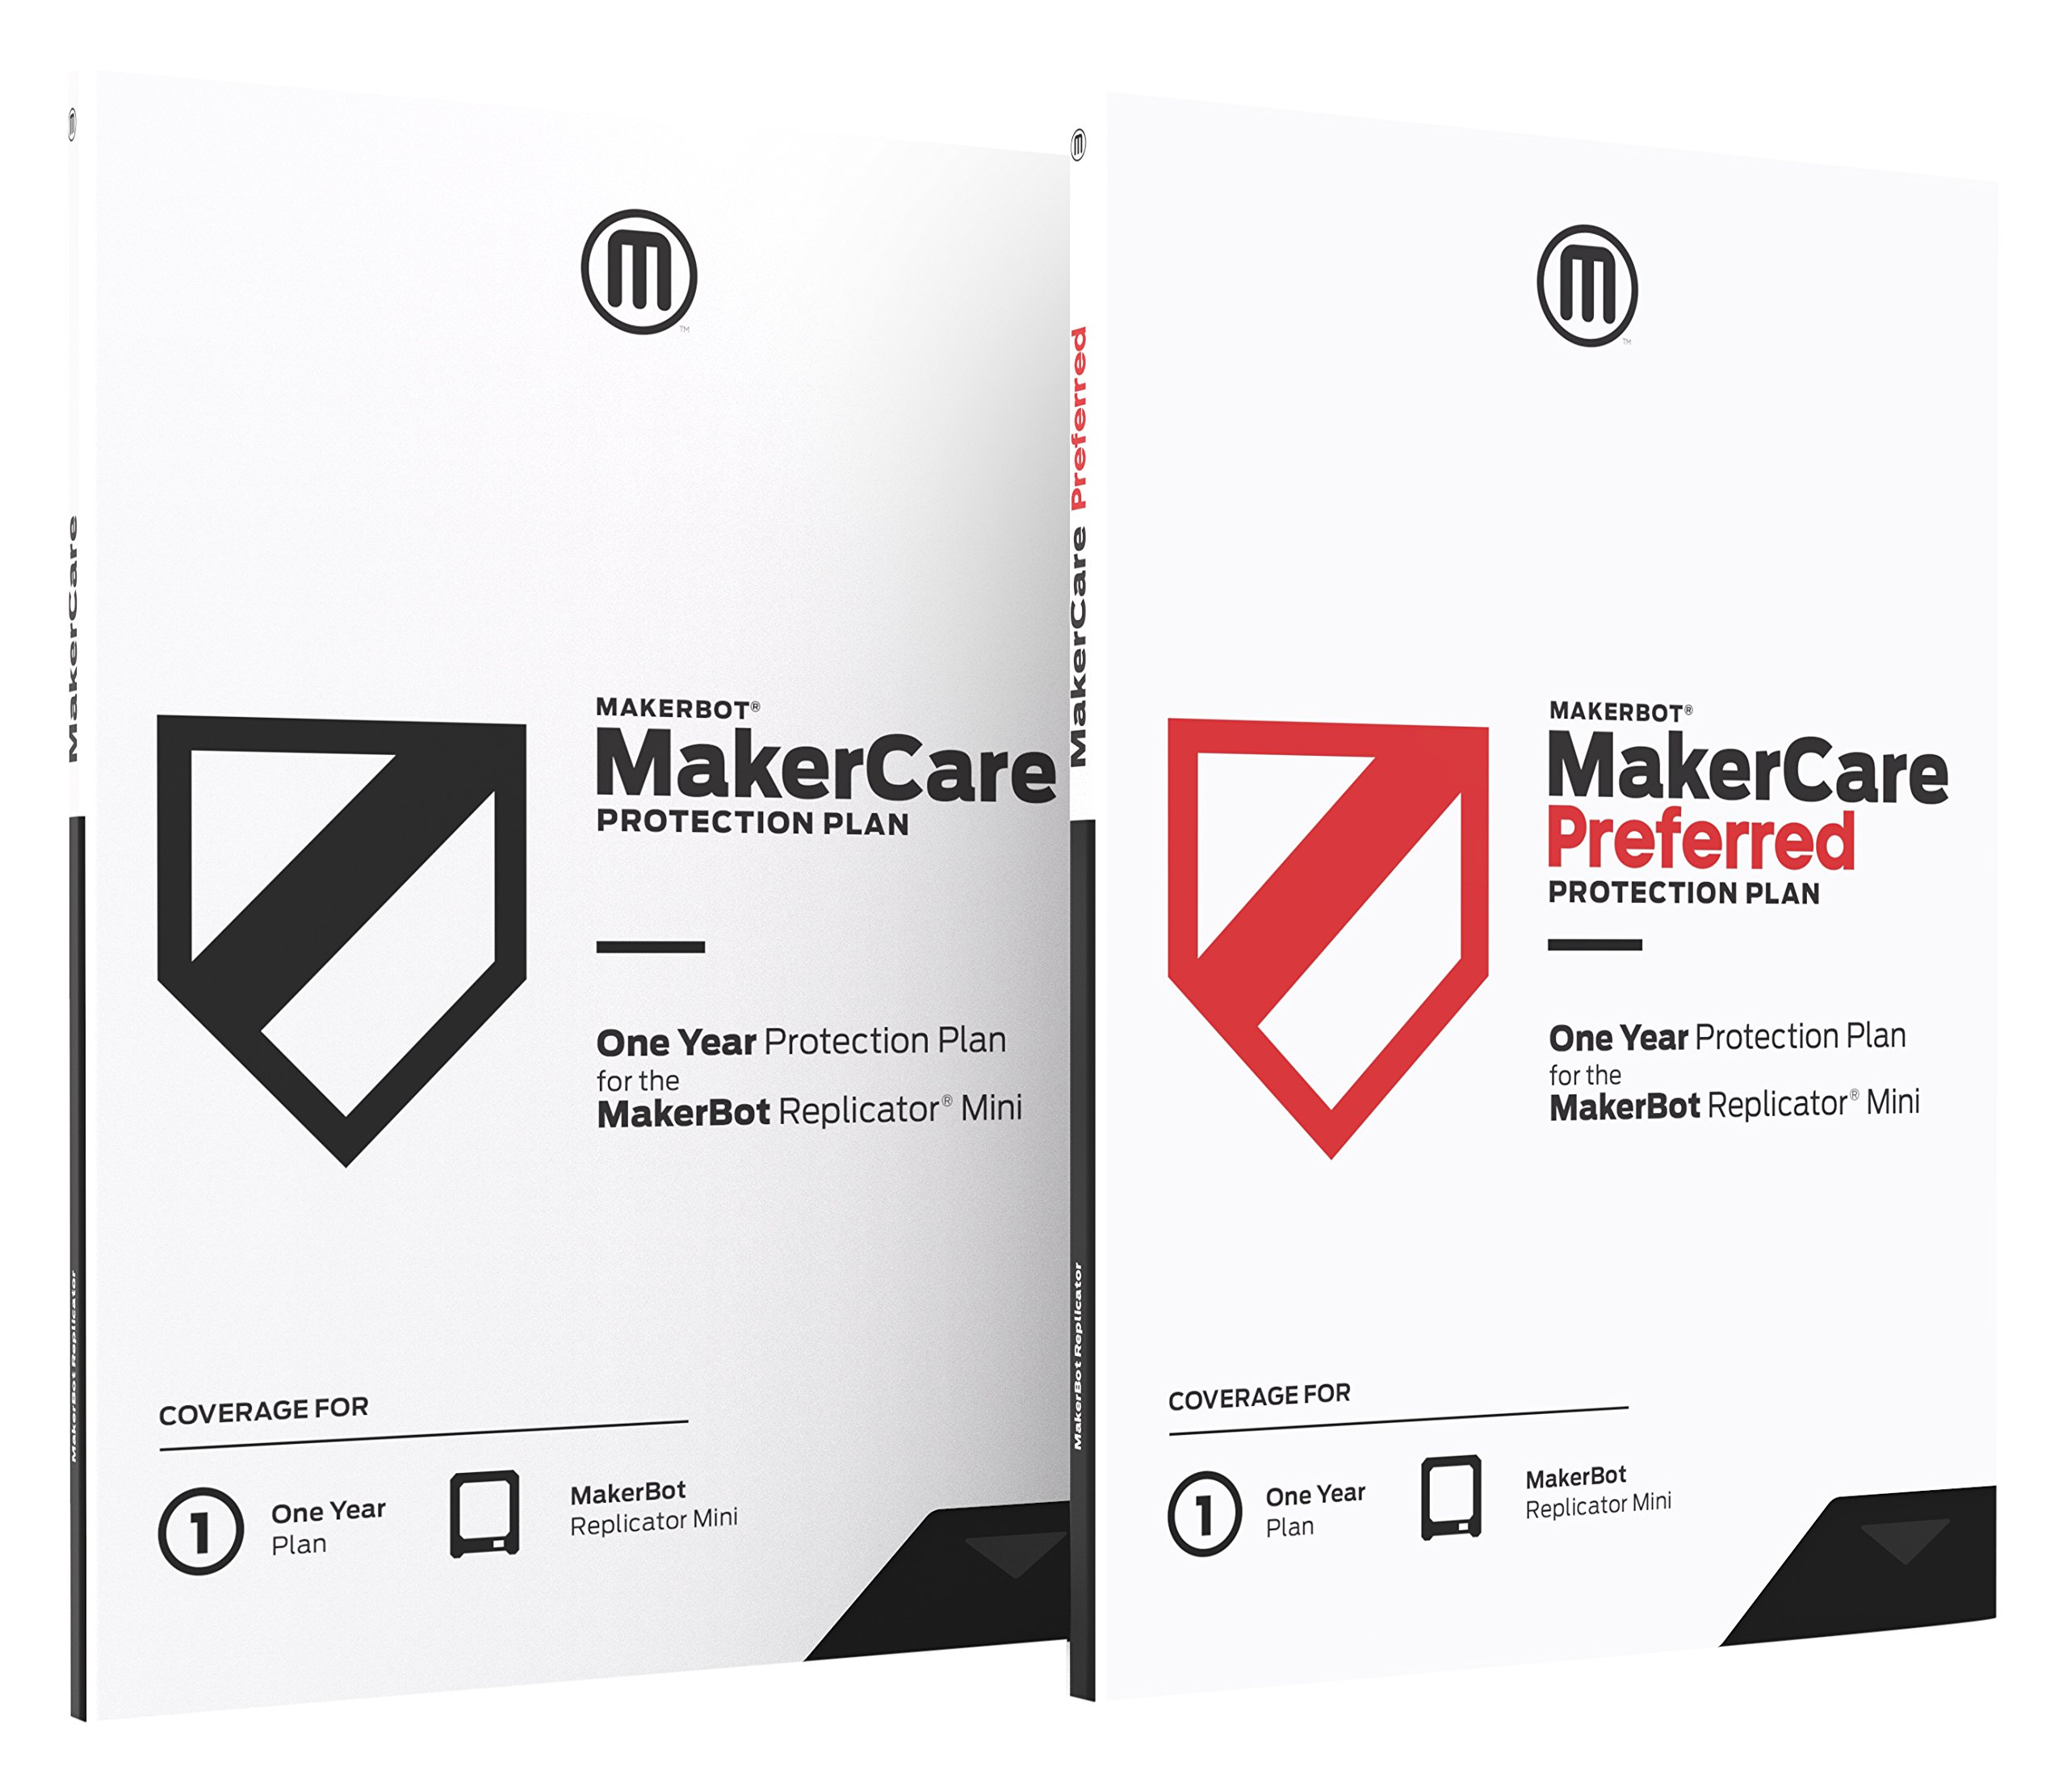 MakerBot MP07020 Makercare Preferred Protection Plan for Replicator Mini+ - 1 Year